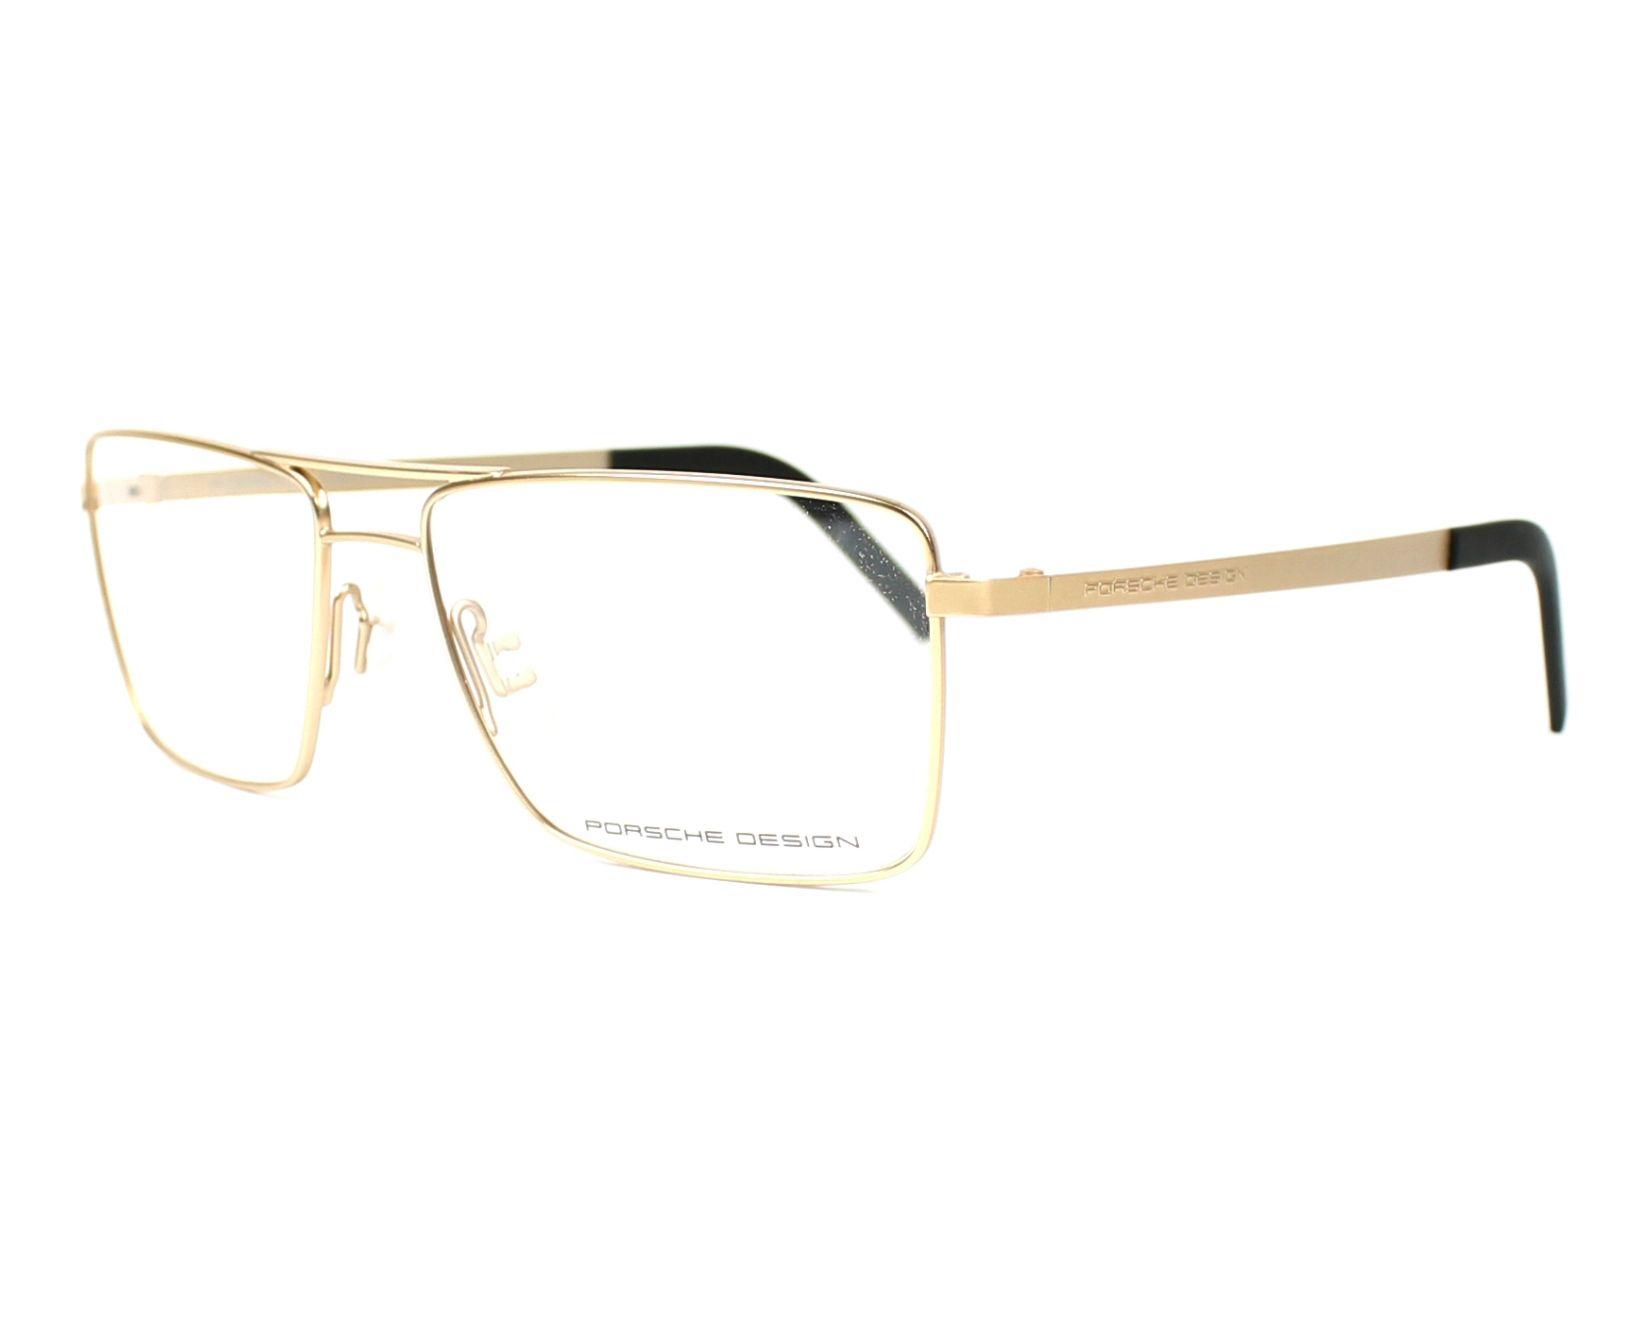 05706da0a66e eyeglasses Porsche Design P-8281 C 56-16 Gold profile view